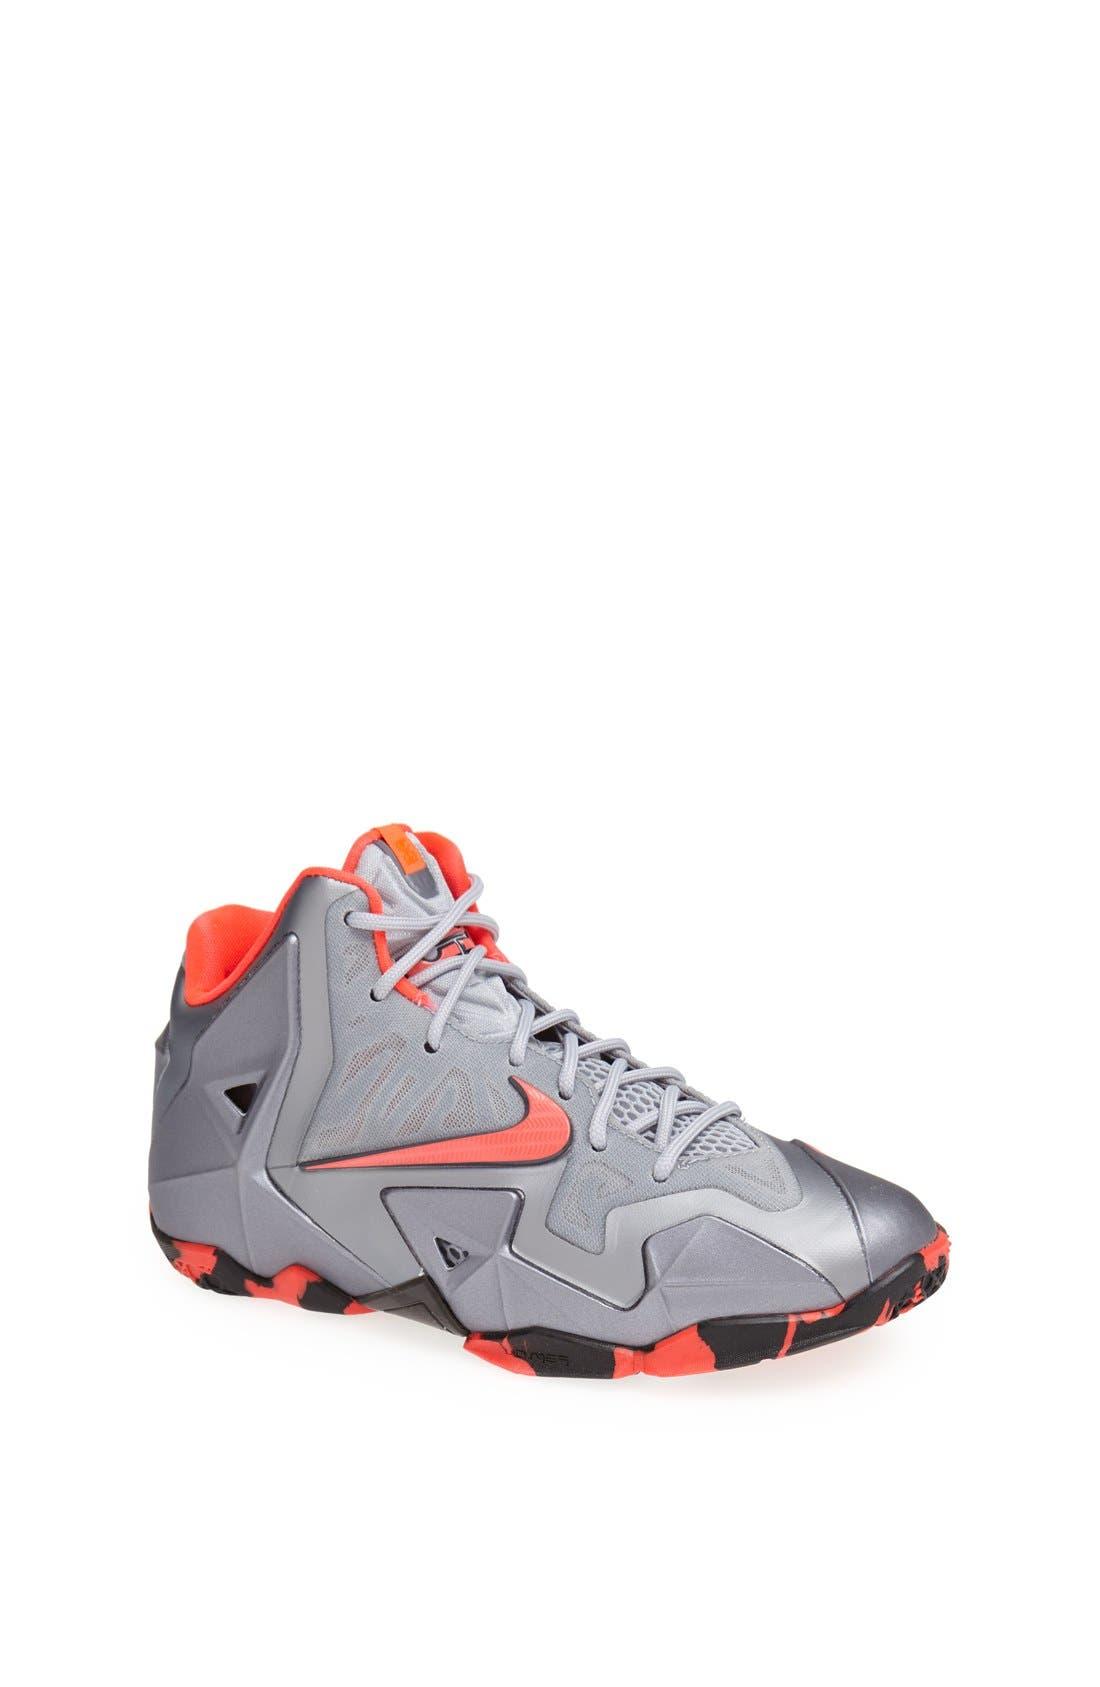 Alternate Image 1 Selected - Nike 'LeBron XI' Basketball Shoe (Big Kid)